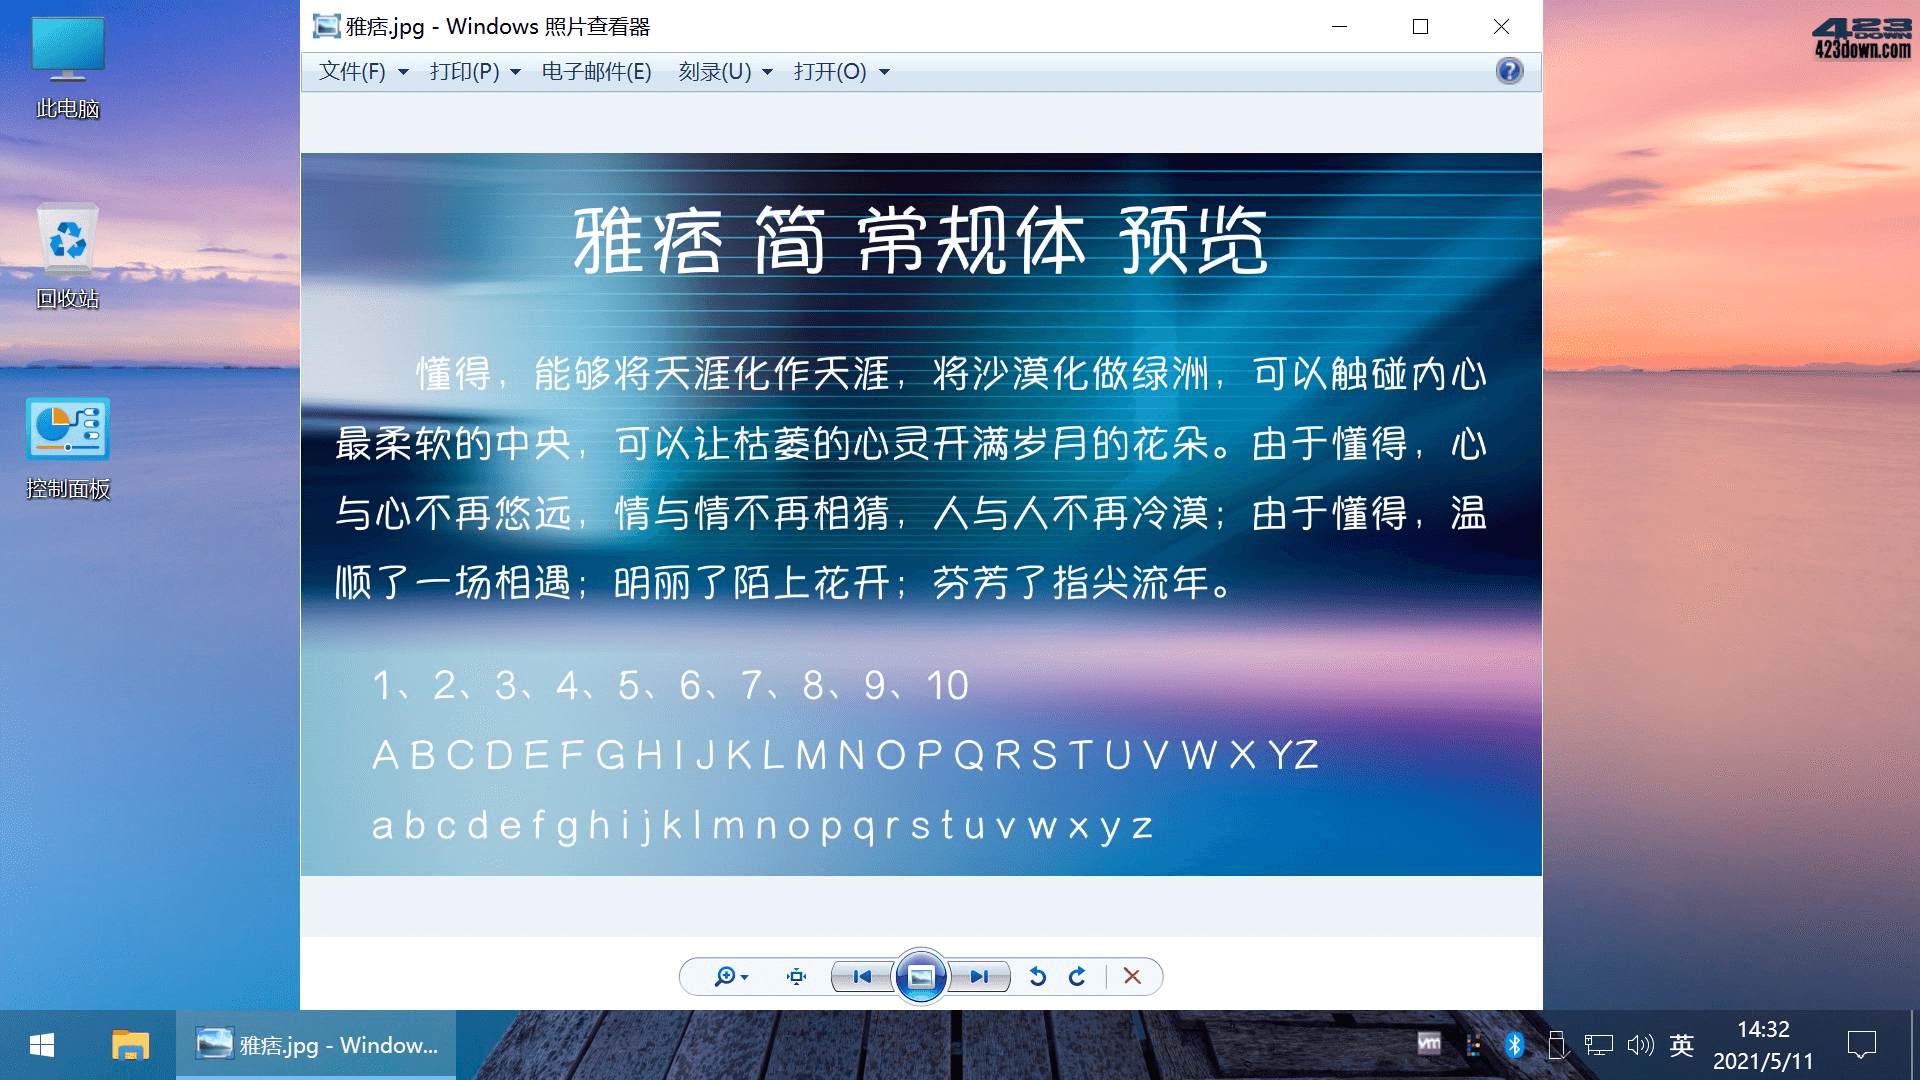 Windows 10 LTSC 2019不忘初心美化精简版-QQ前线乐园